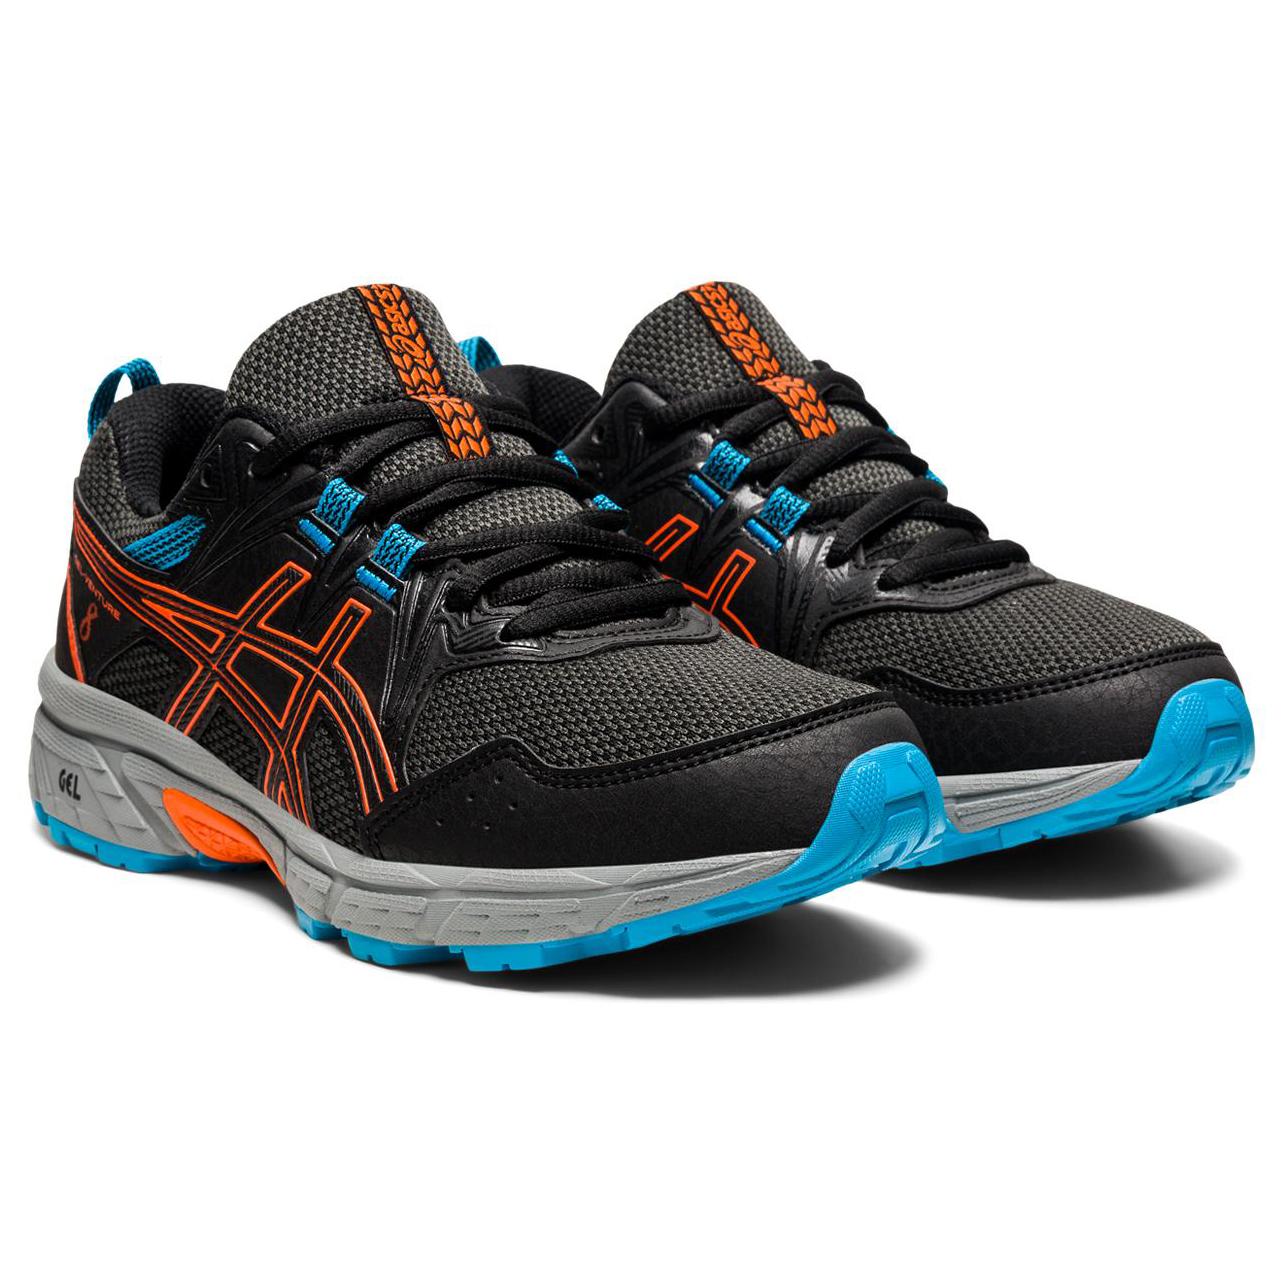 Asics - Kid's Gel-Venture 8 GS - Multisport shoes - Black / Marigold Orange   1,5 (US)